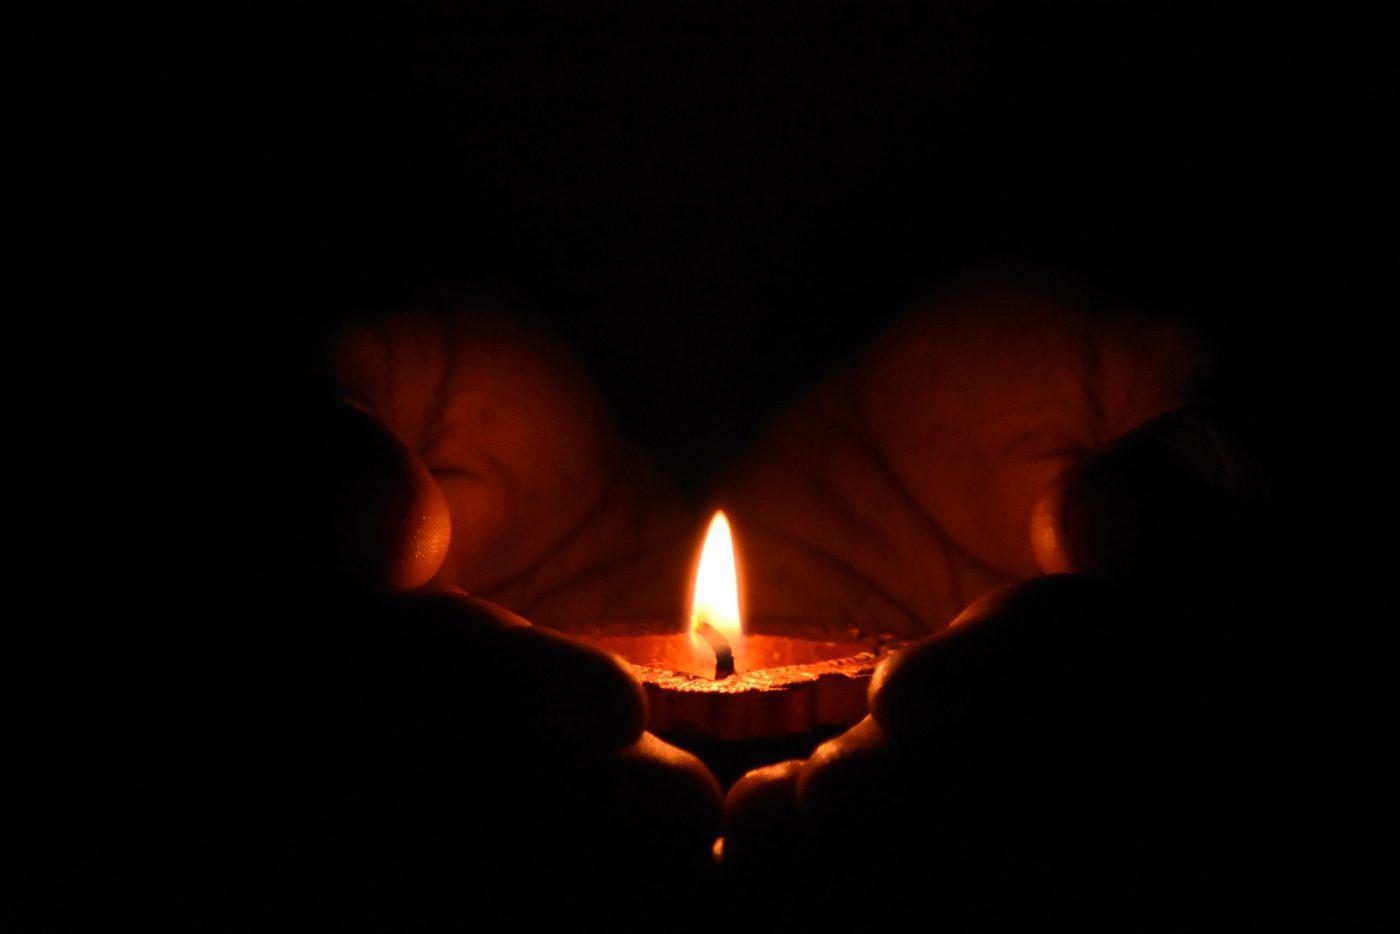 Tealight Candle On Human Palms 783200